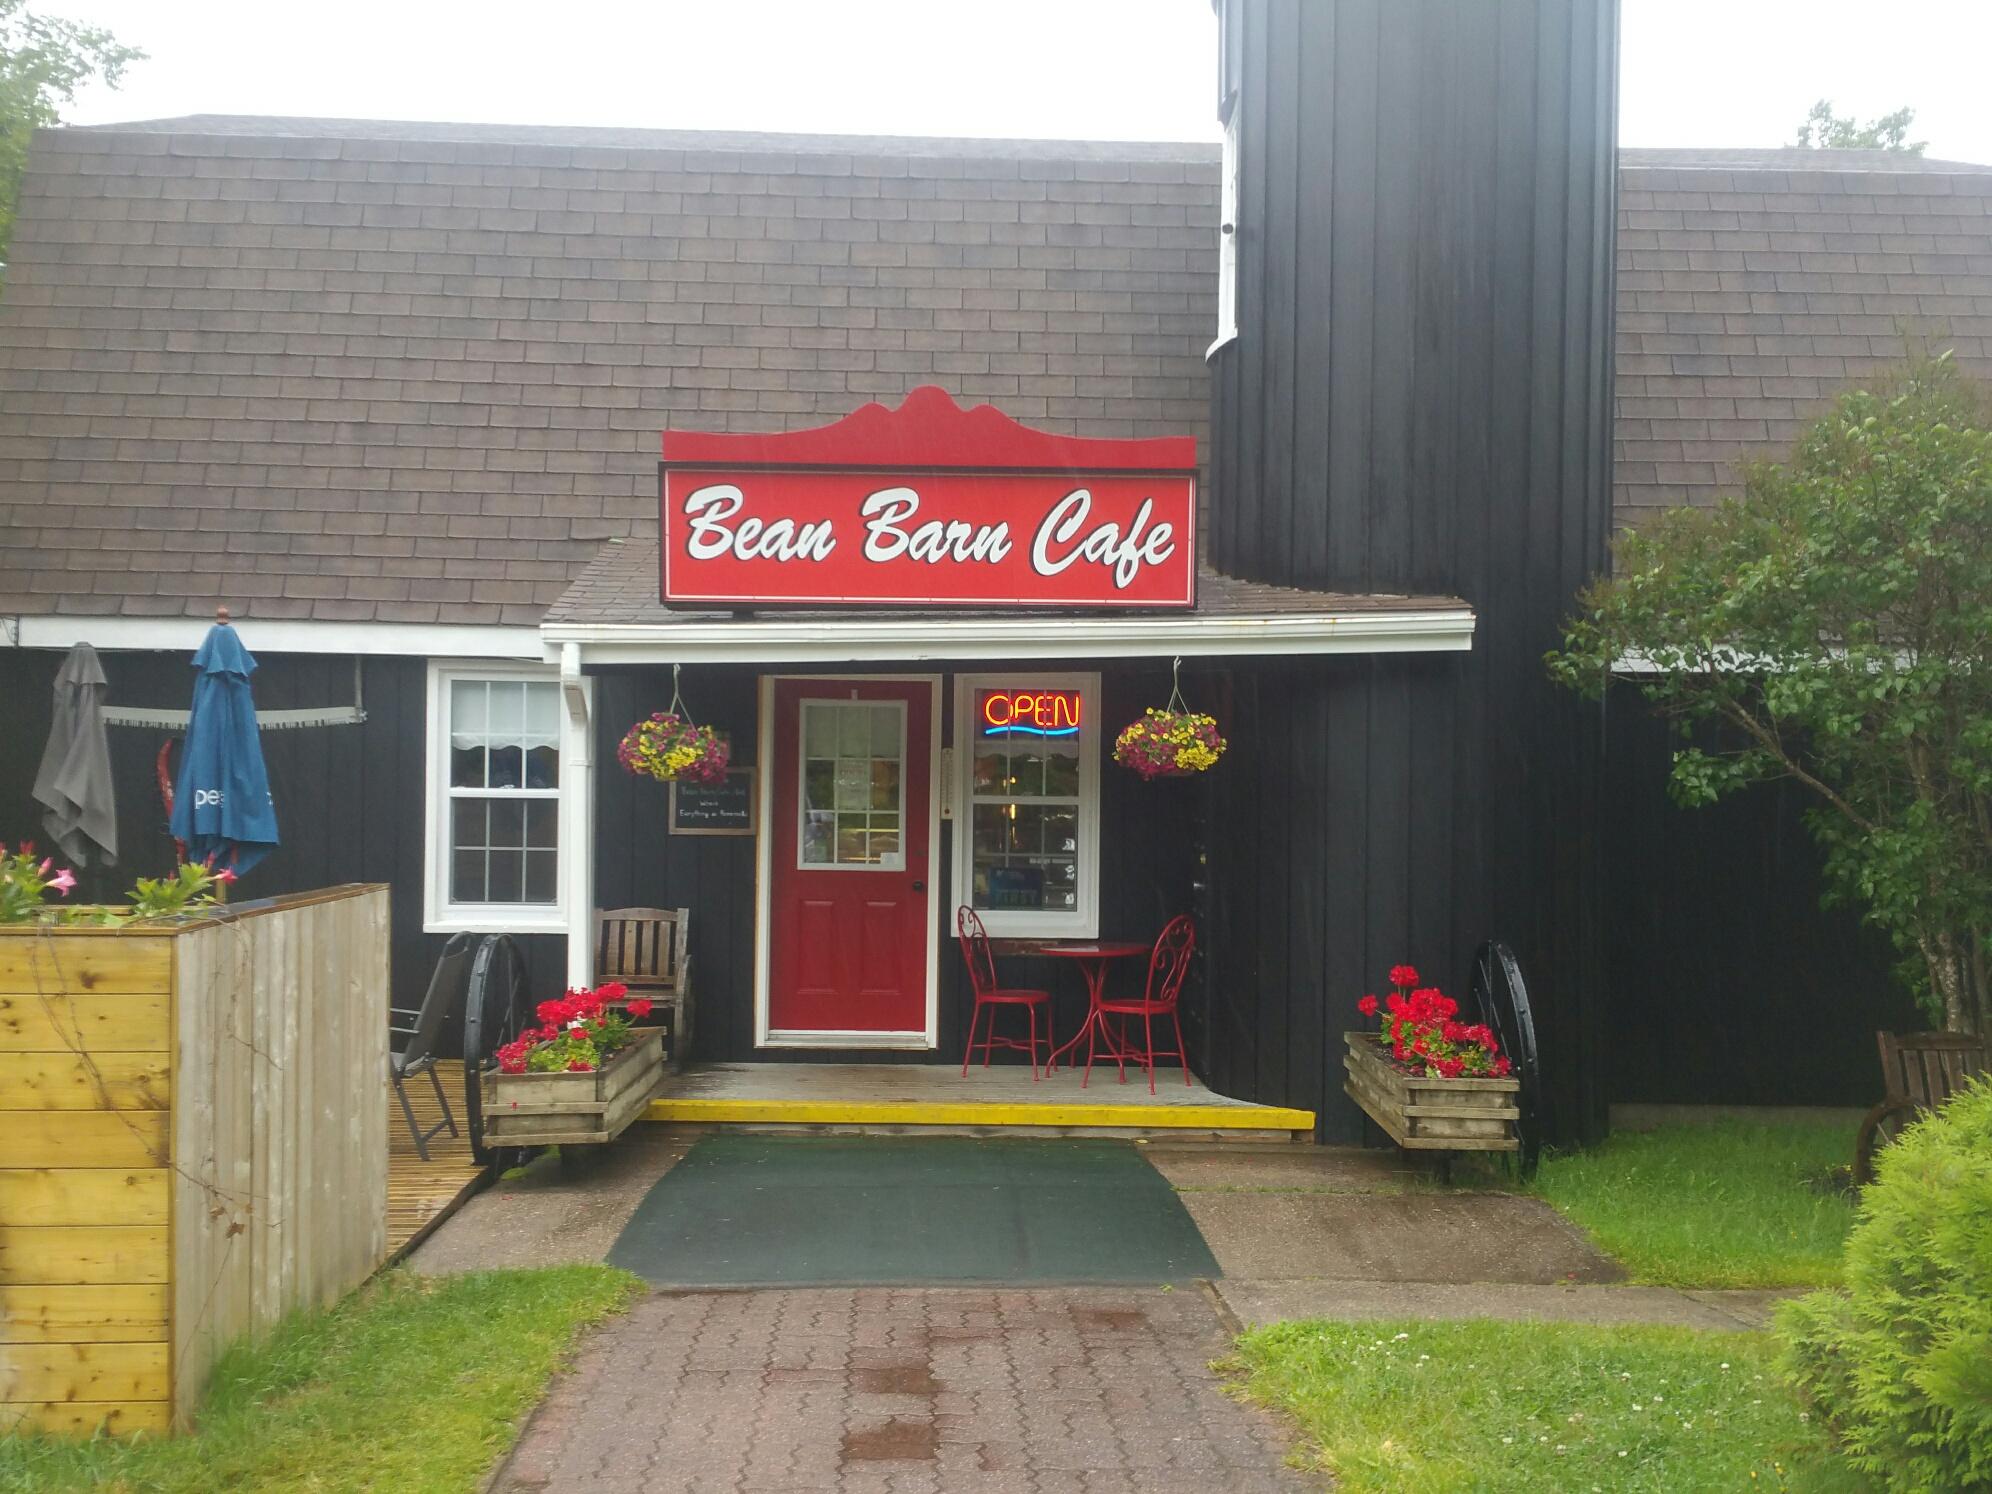 Bean Barn Café